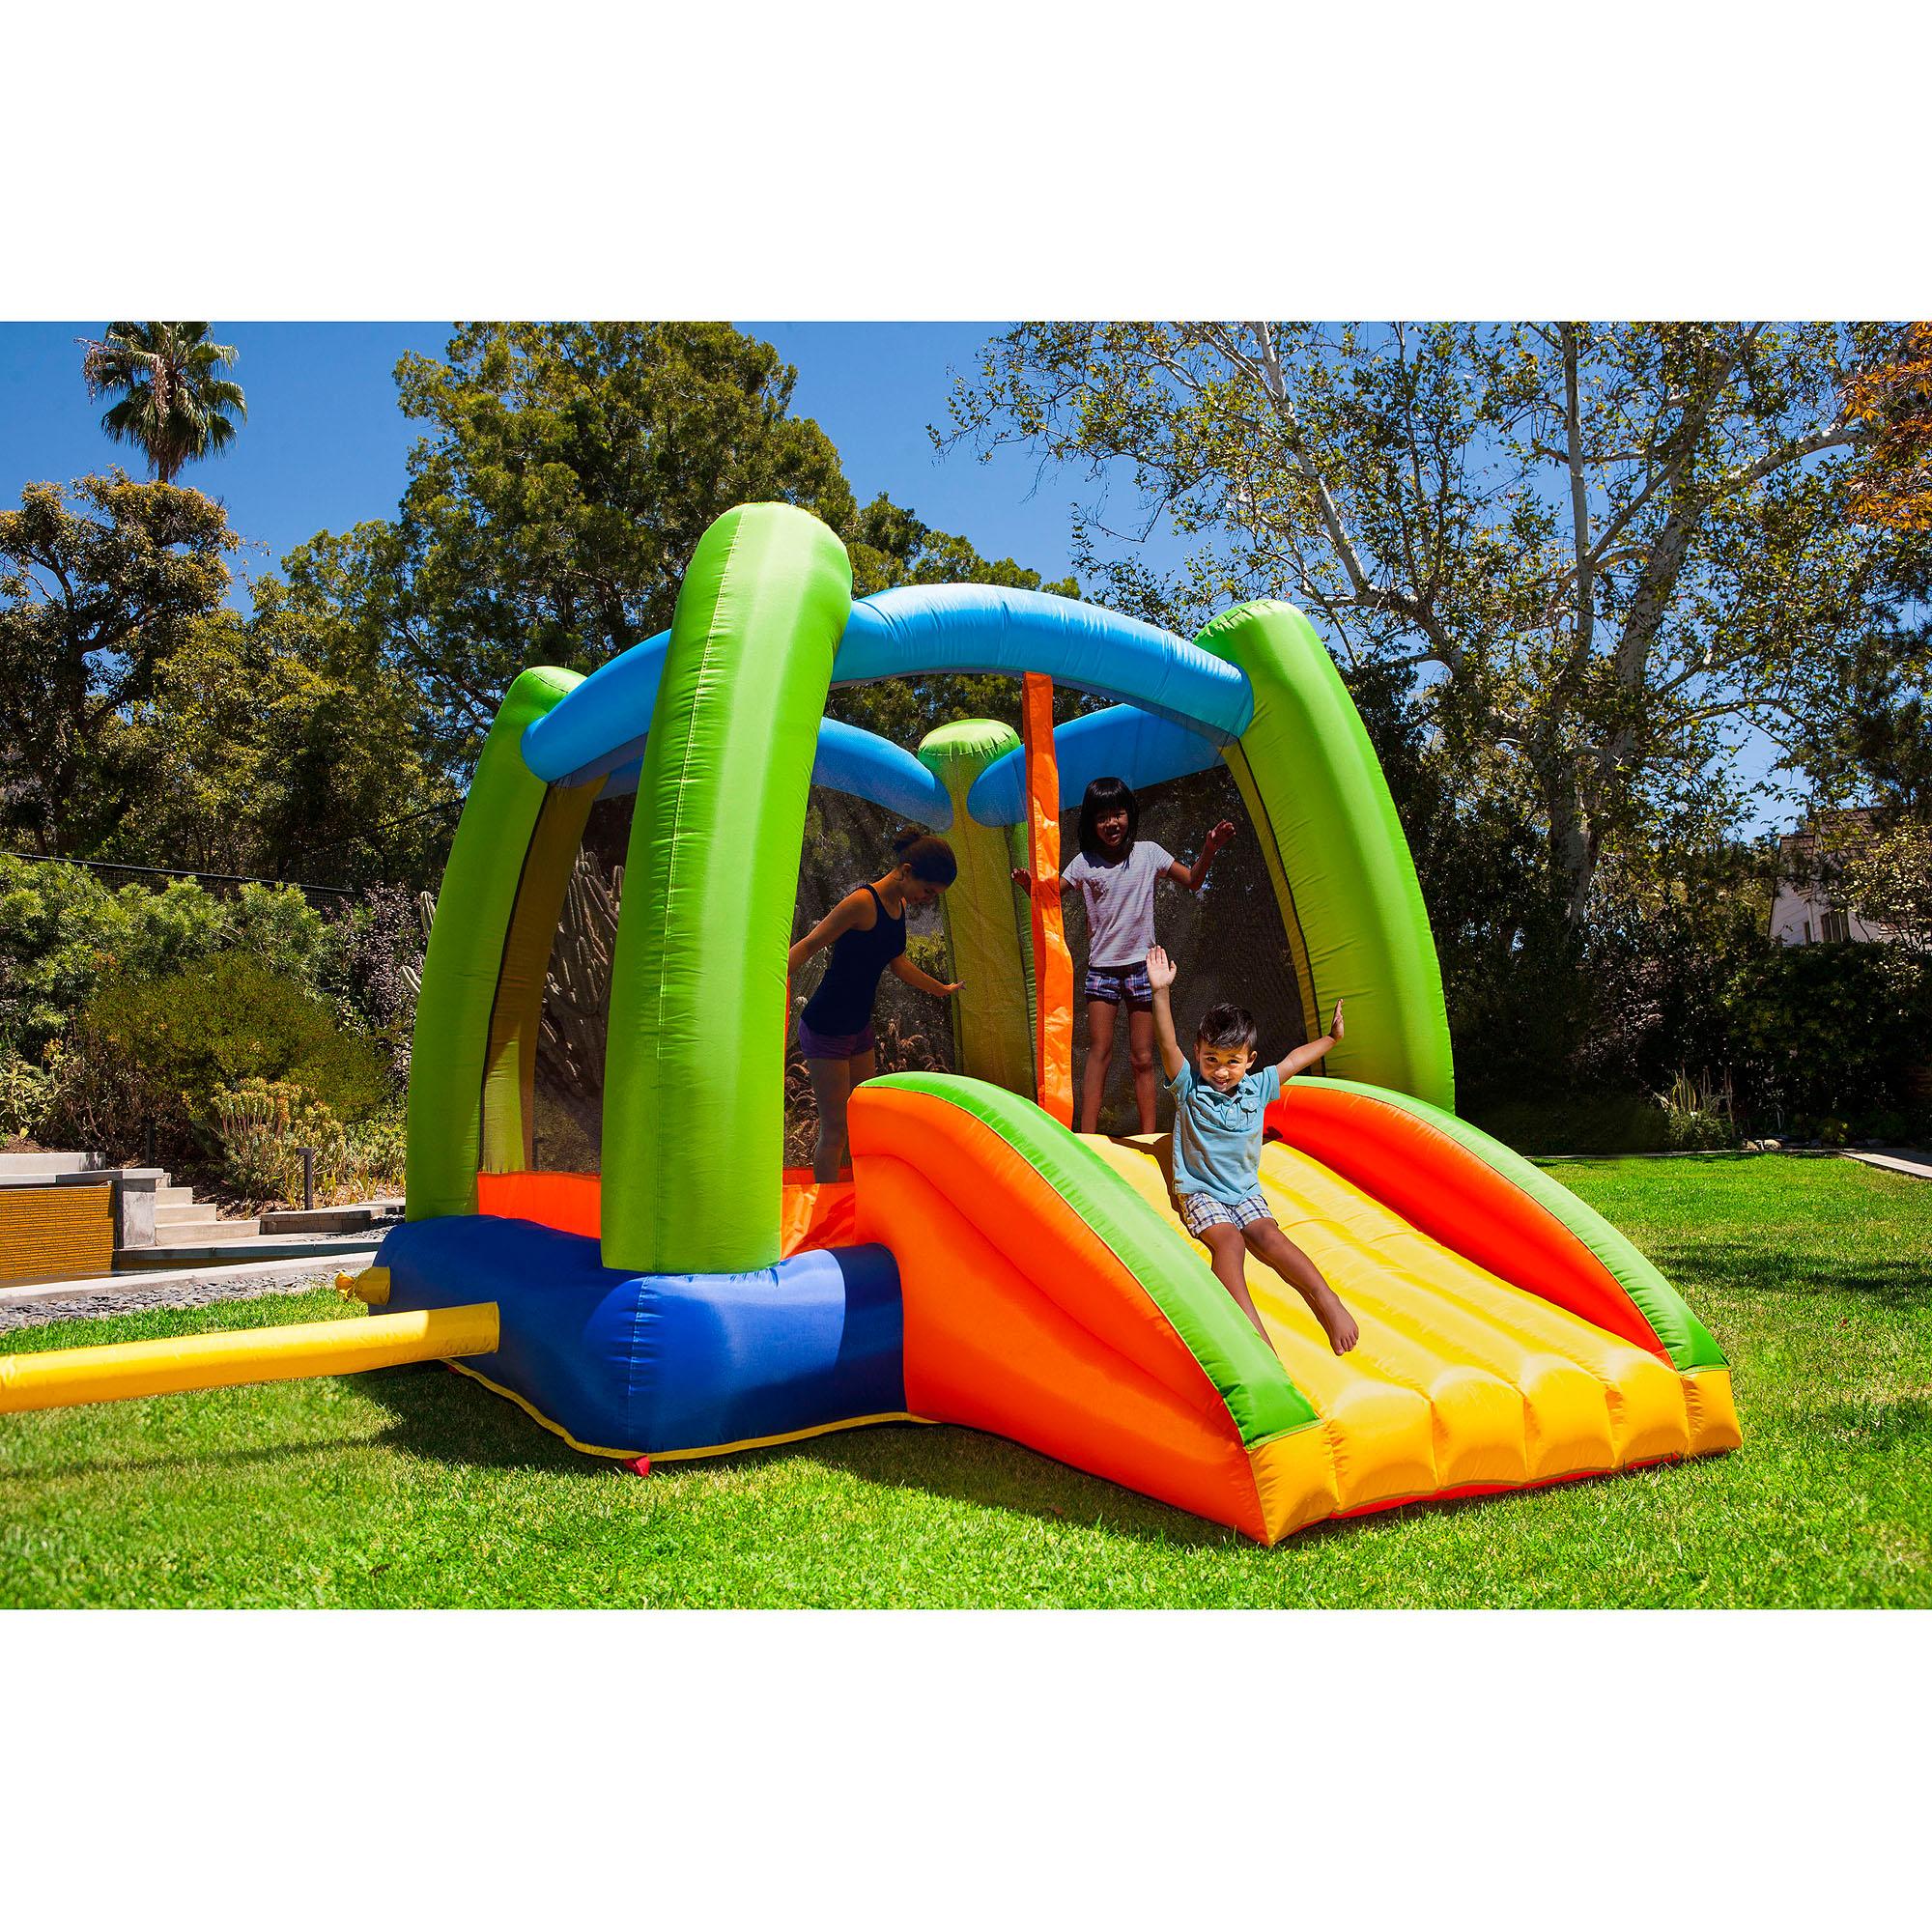 Sportspower Fun Outdoor My First Jump 'n Play